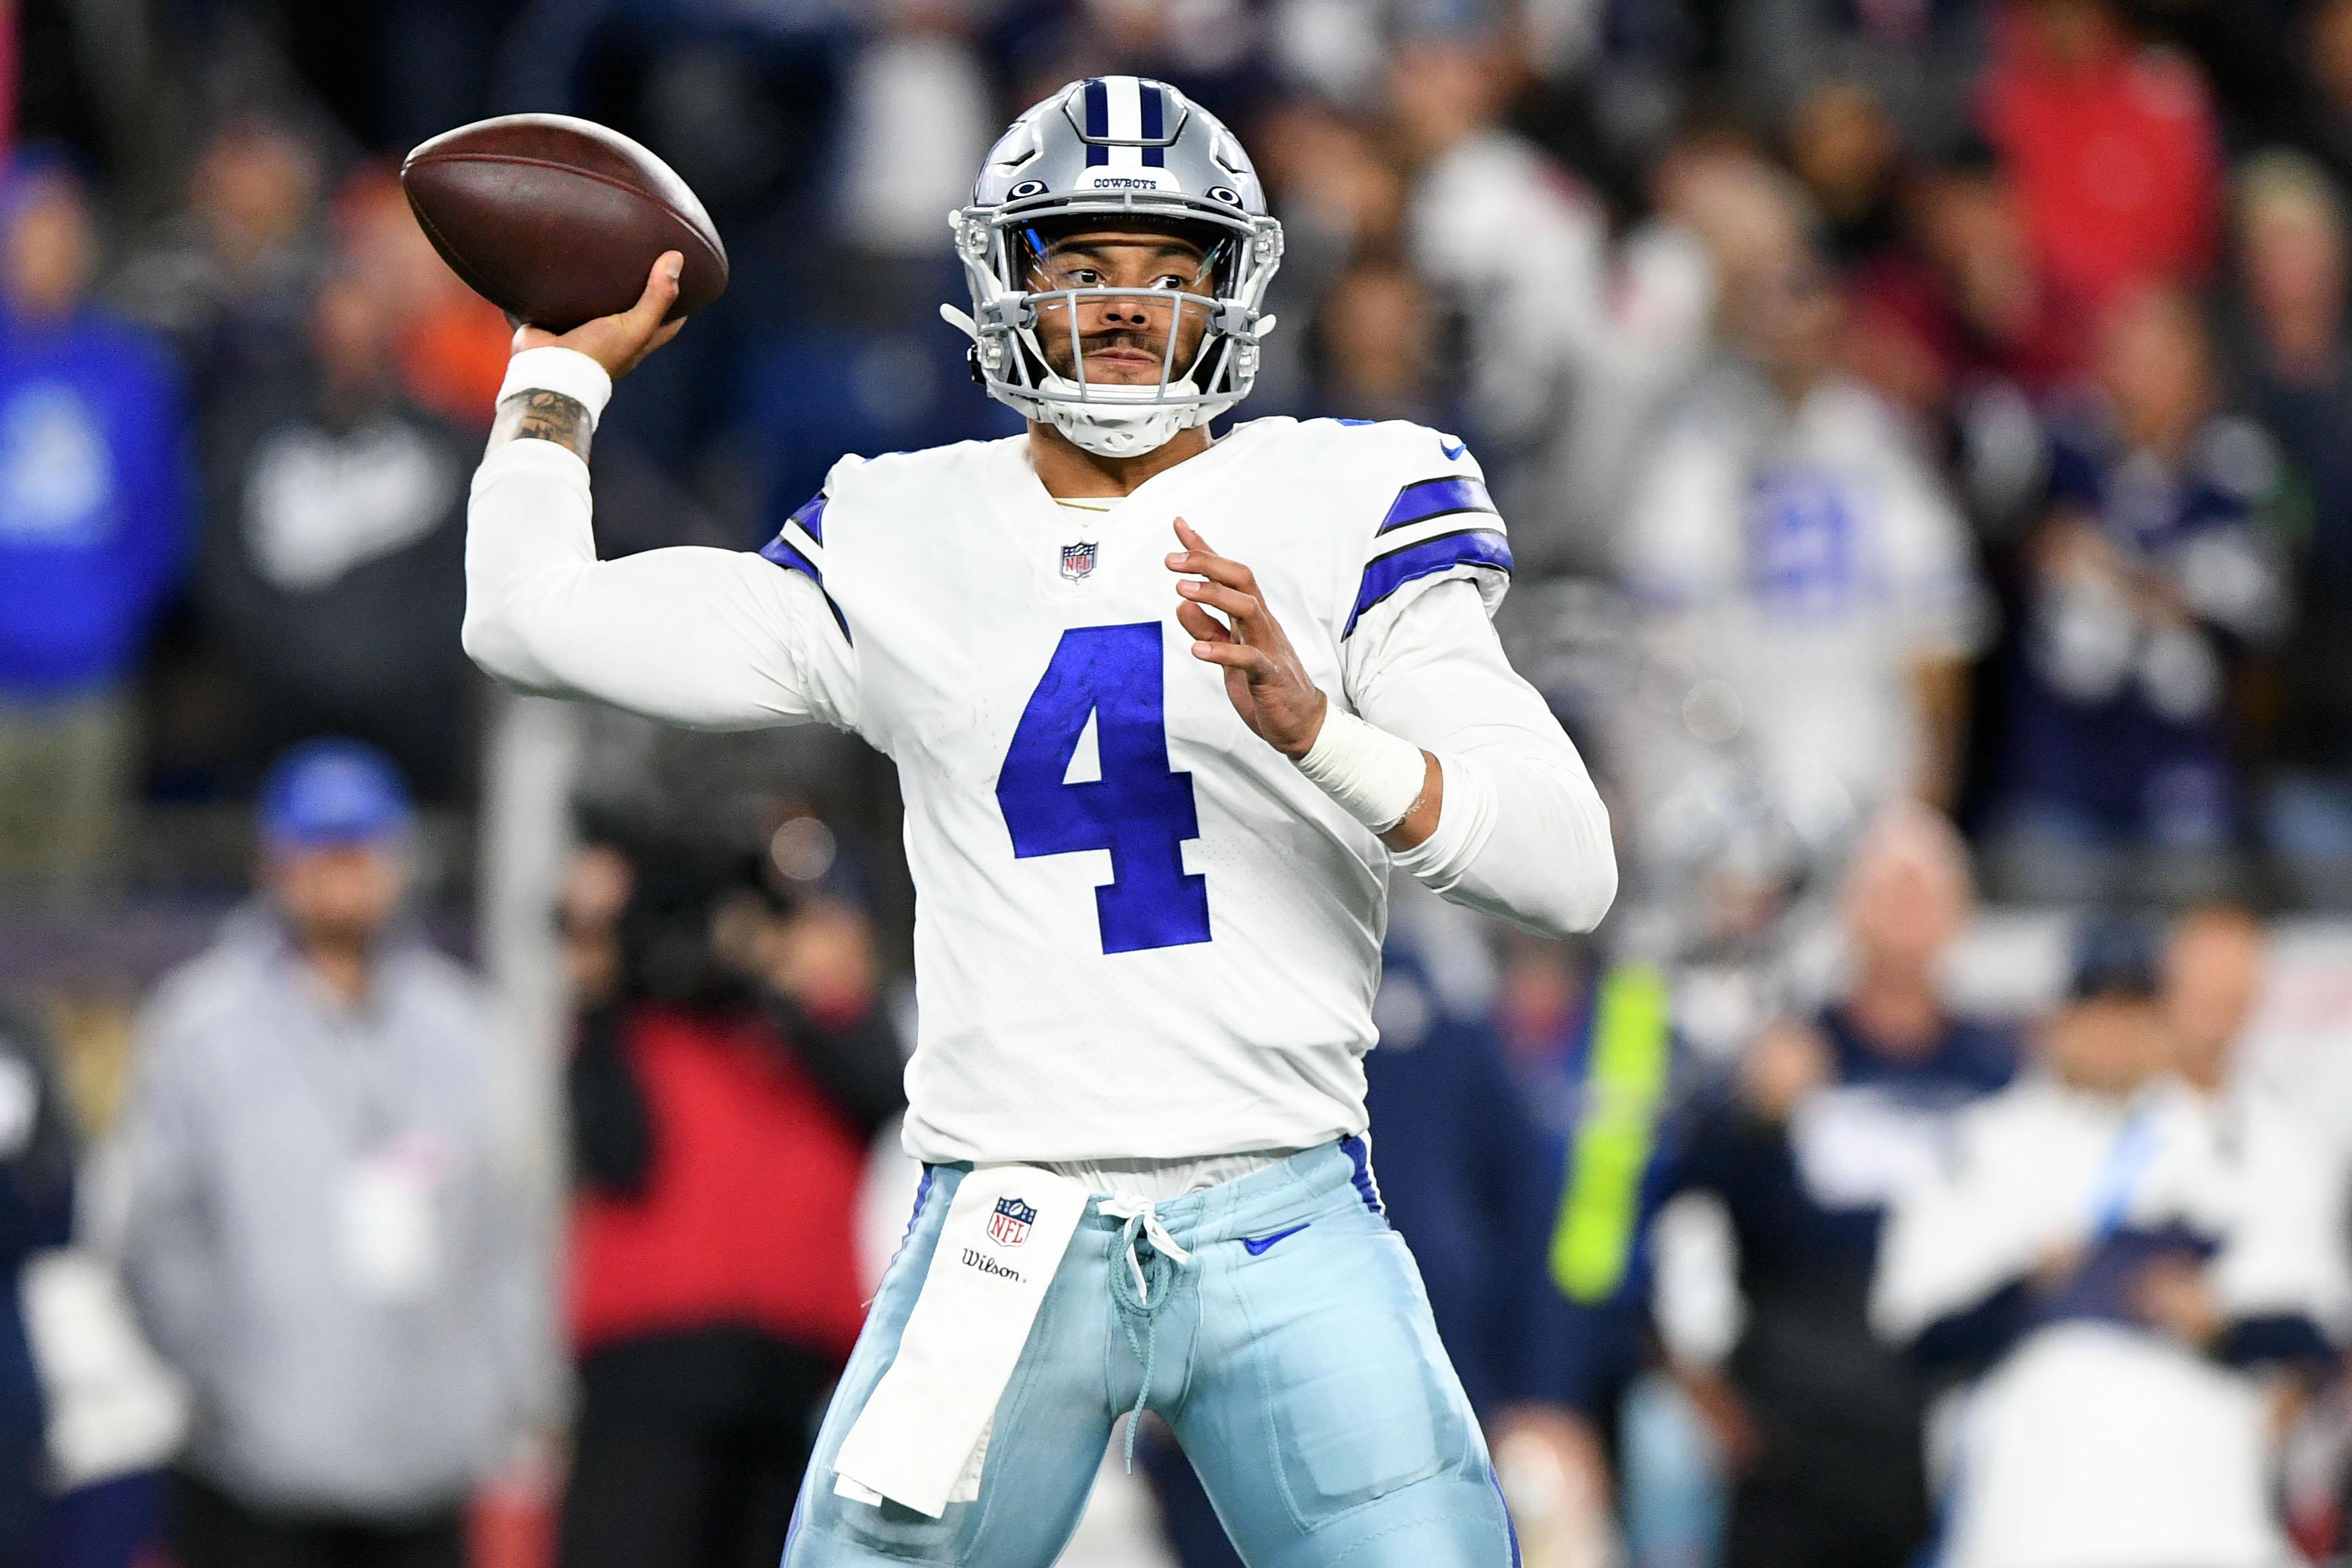 Dallas Cowboys quarterback Dak Prescott (4) passes the ball against the New England Patriots during the second half at Gillette Stadium.